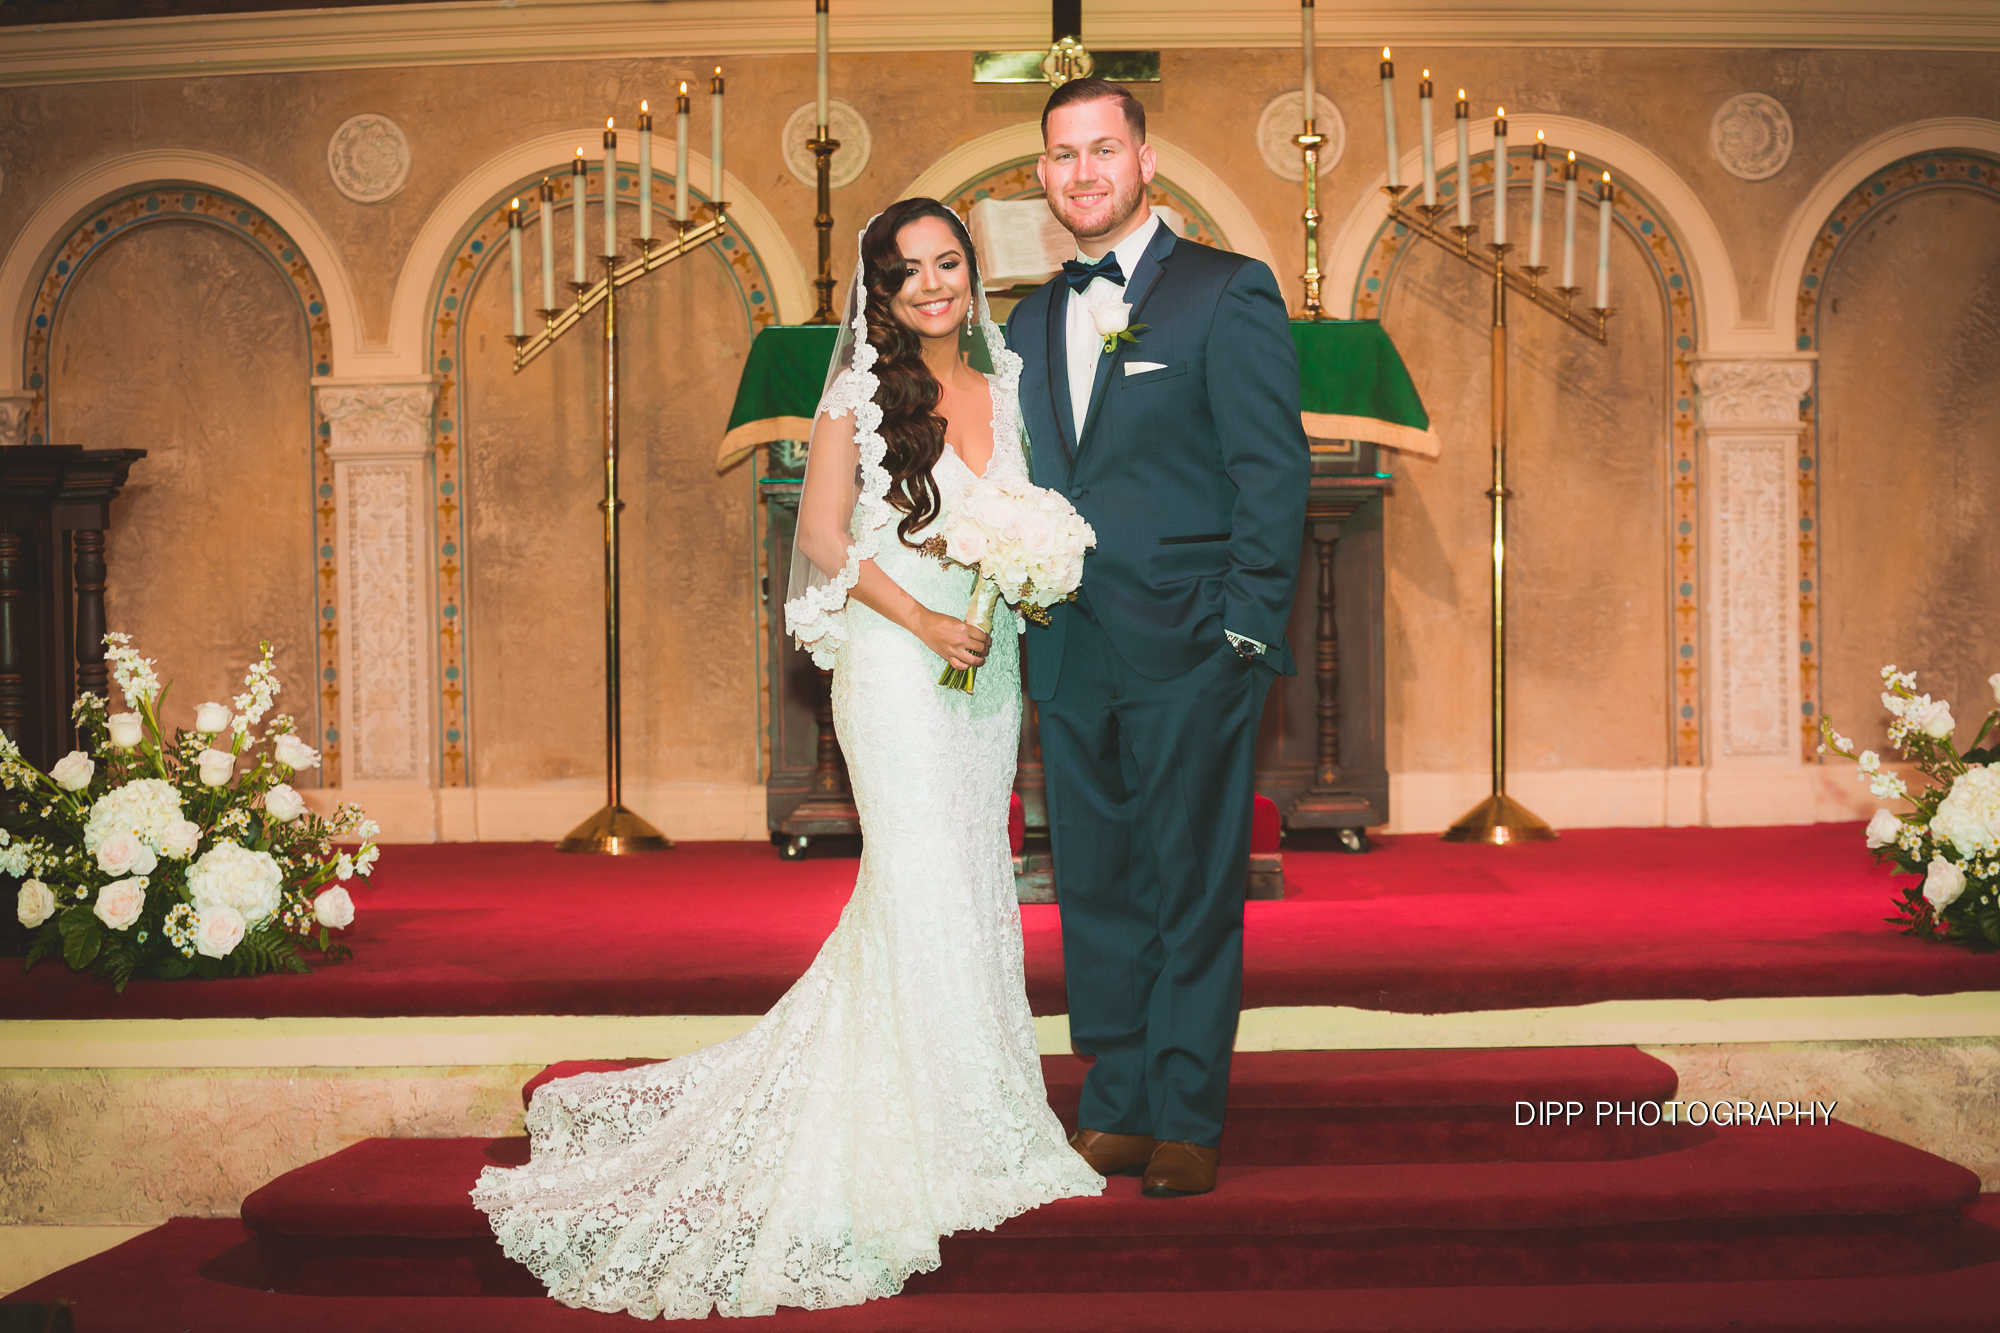 Dipp_2016 EDITED Melissa & Avilio Wedding-253